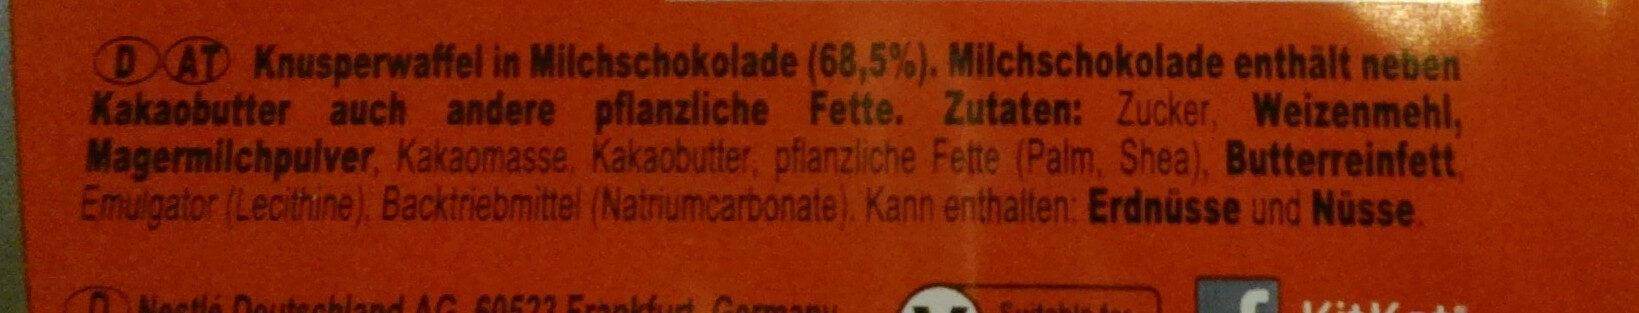 kitkat - Ingredients - de